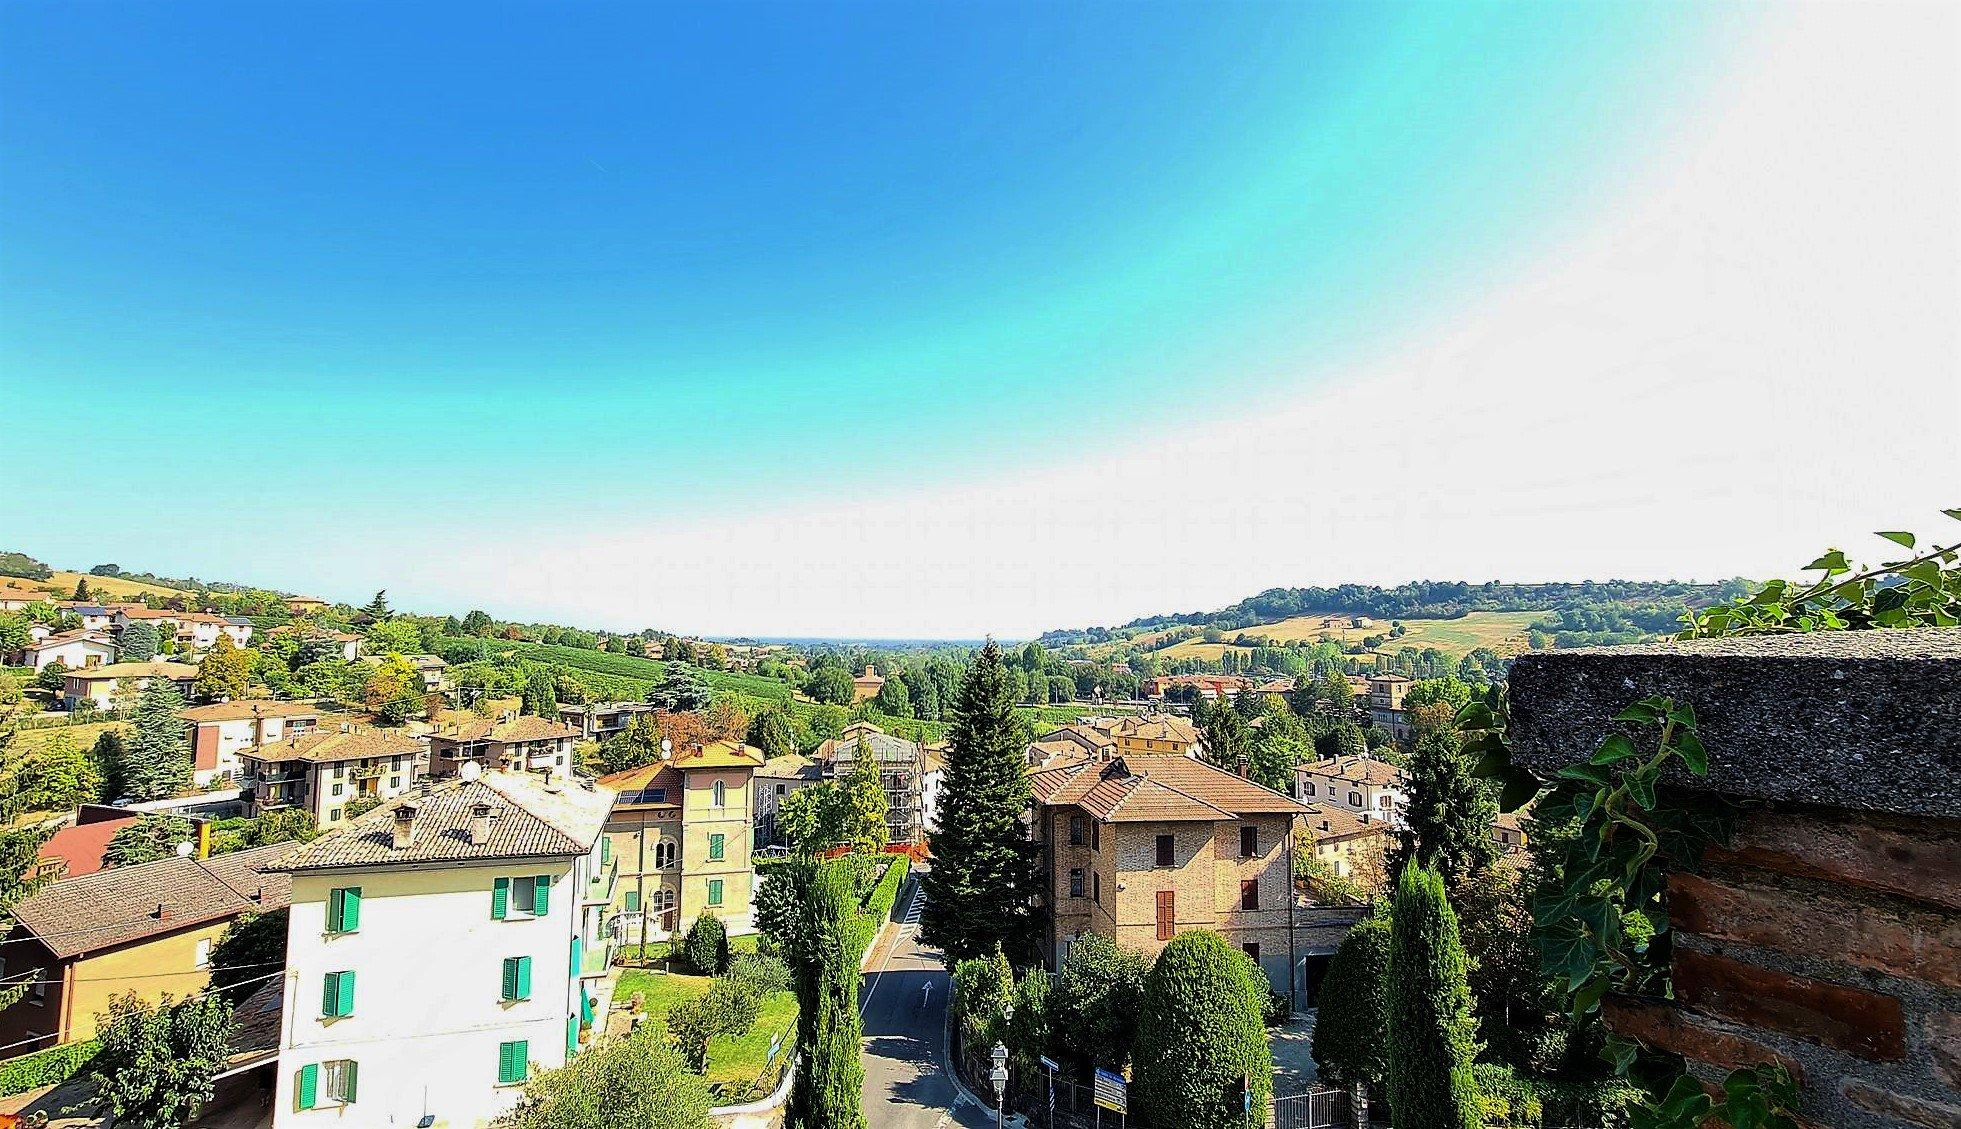 Il panorama da Castelvetro